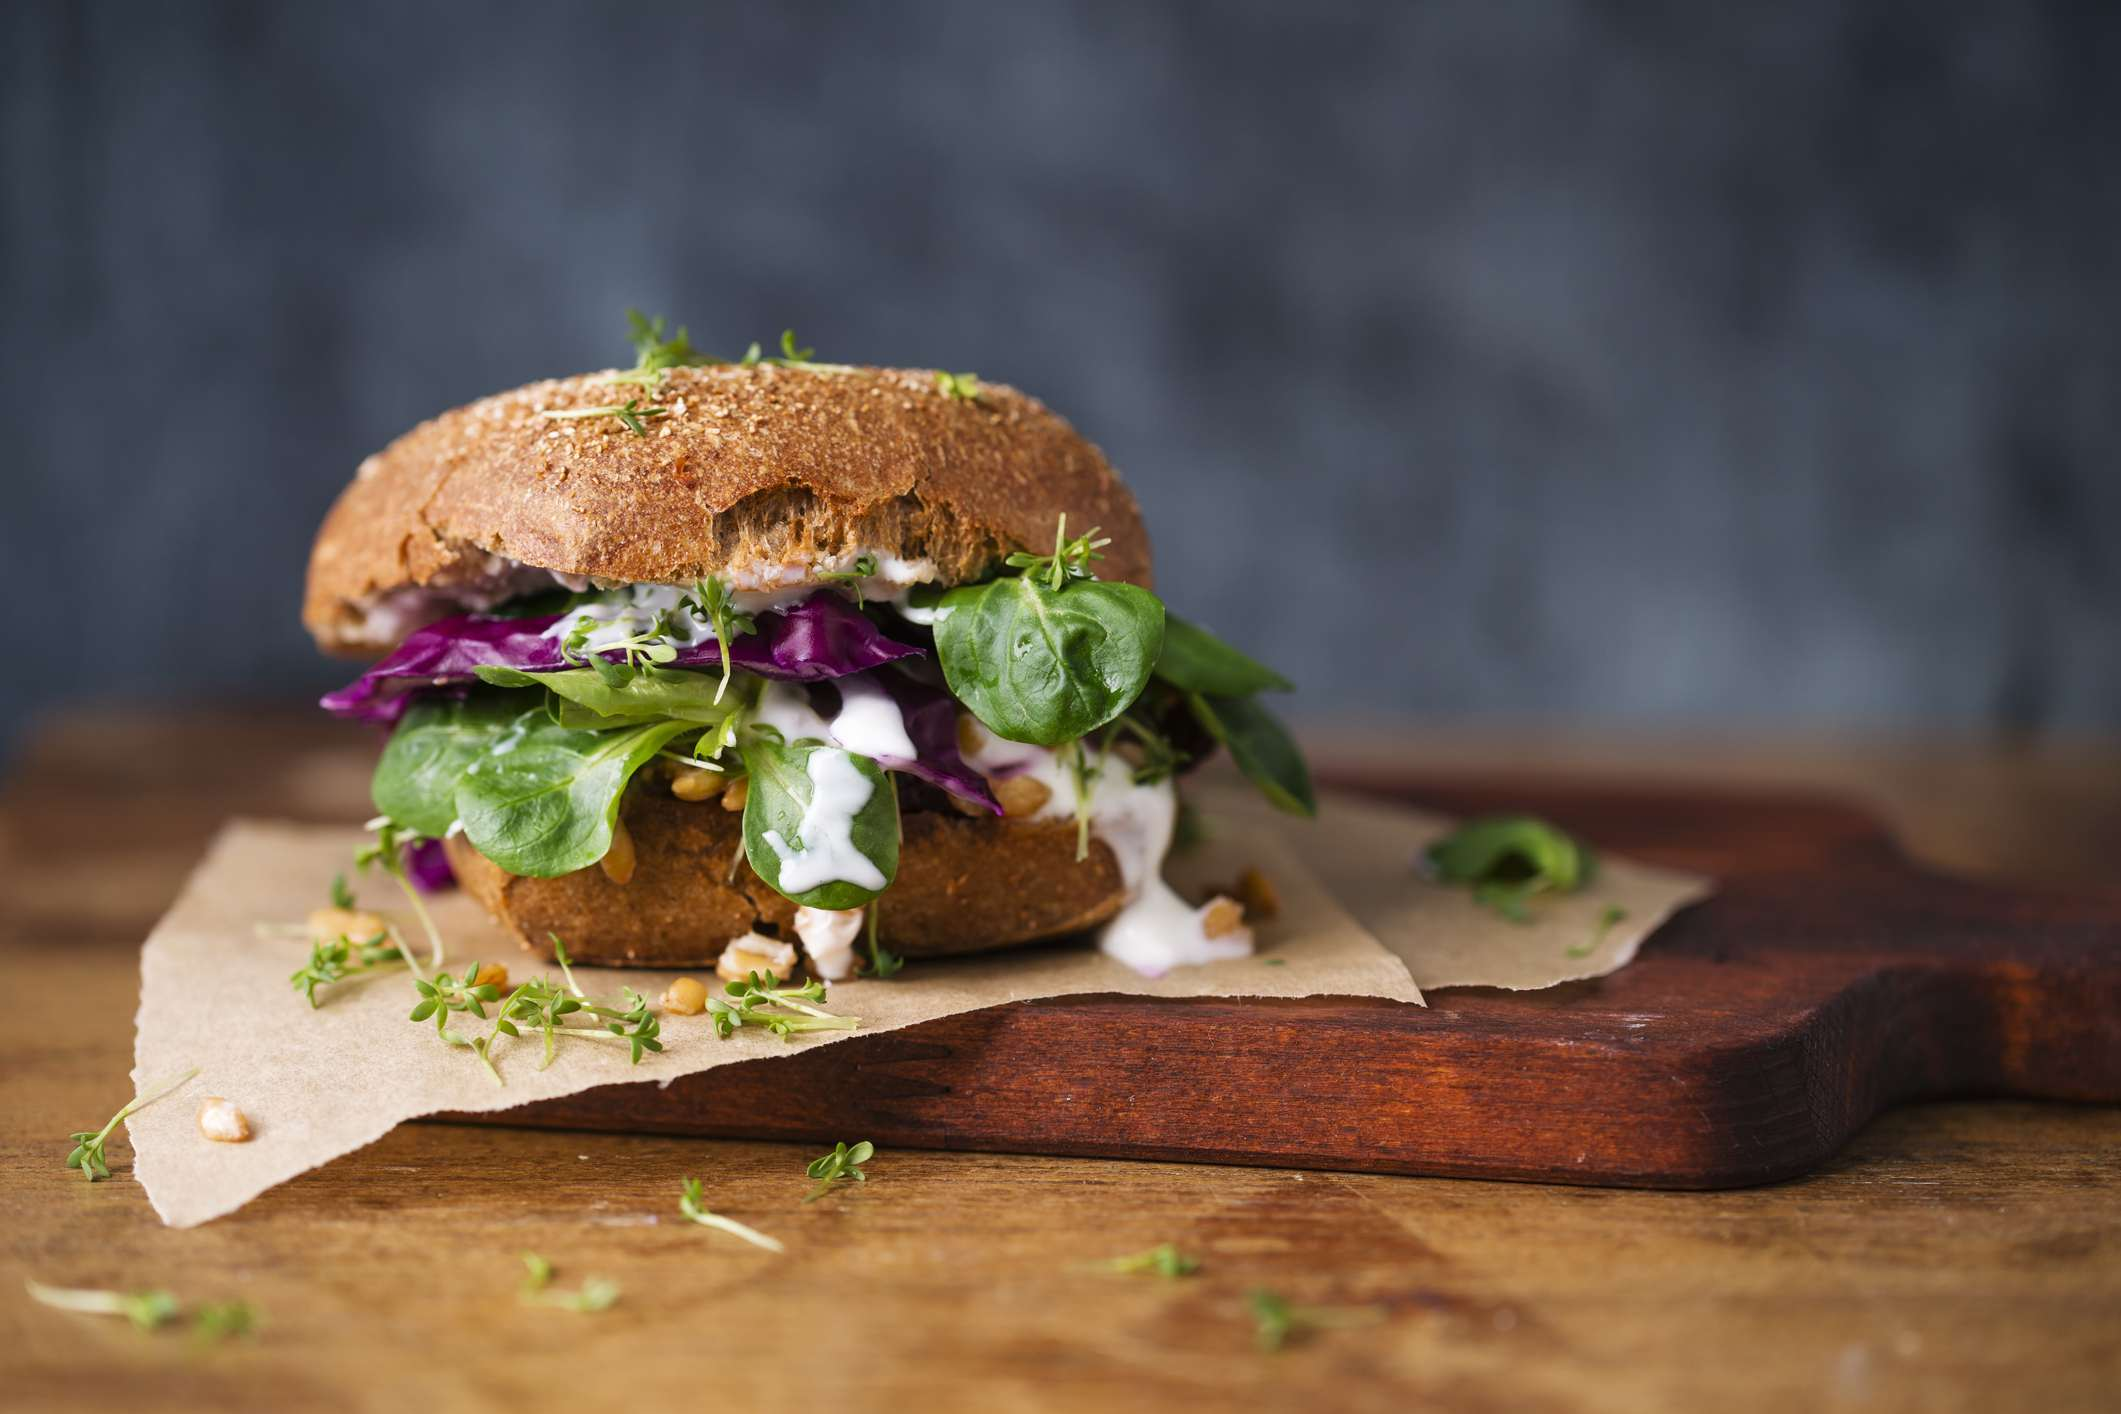 A close-up of a veggie burger.